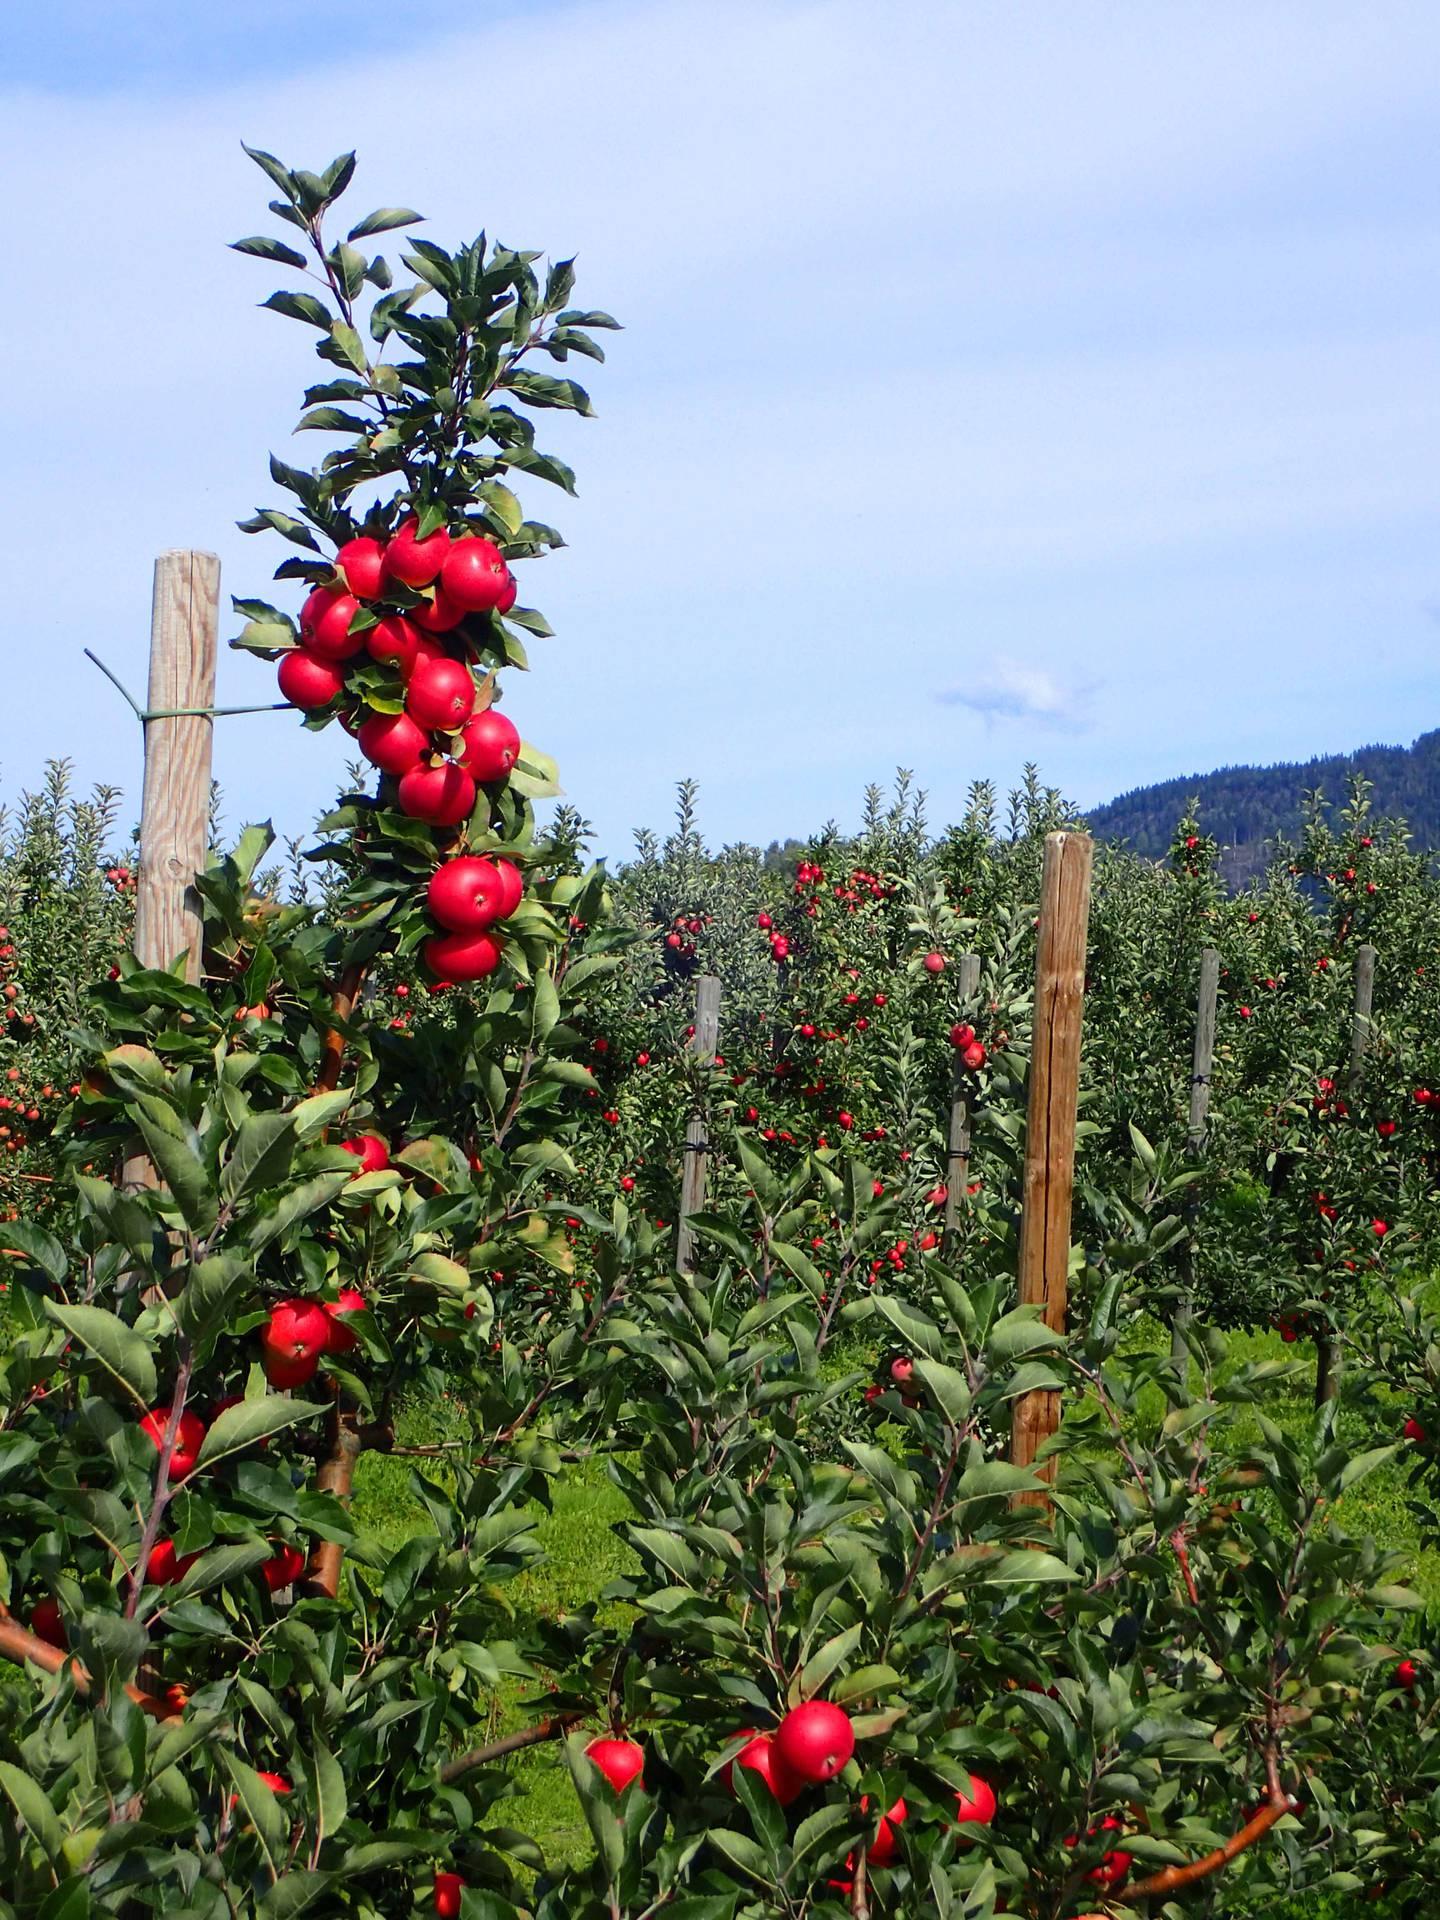 Røde epler i grønne Lier. Fra den gamle Lierbanen ved Landfall.